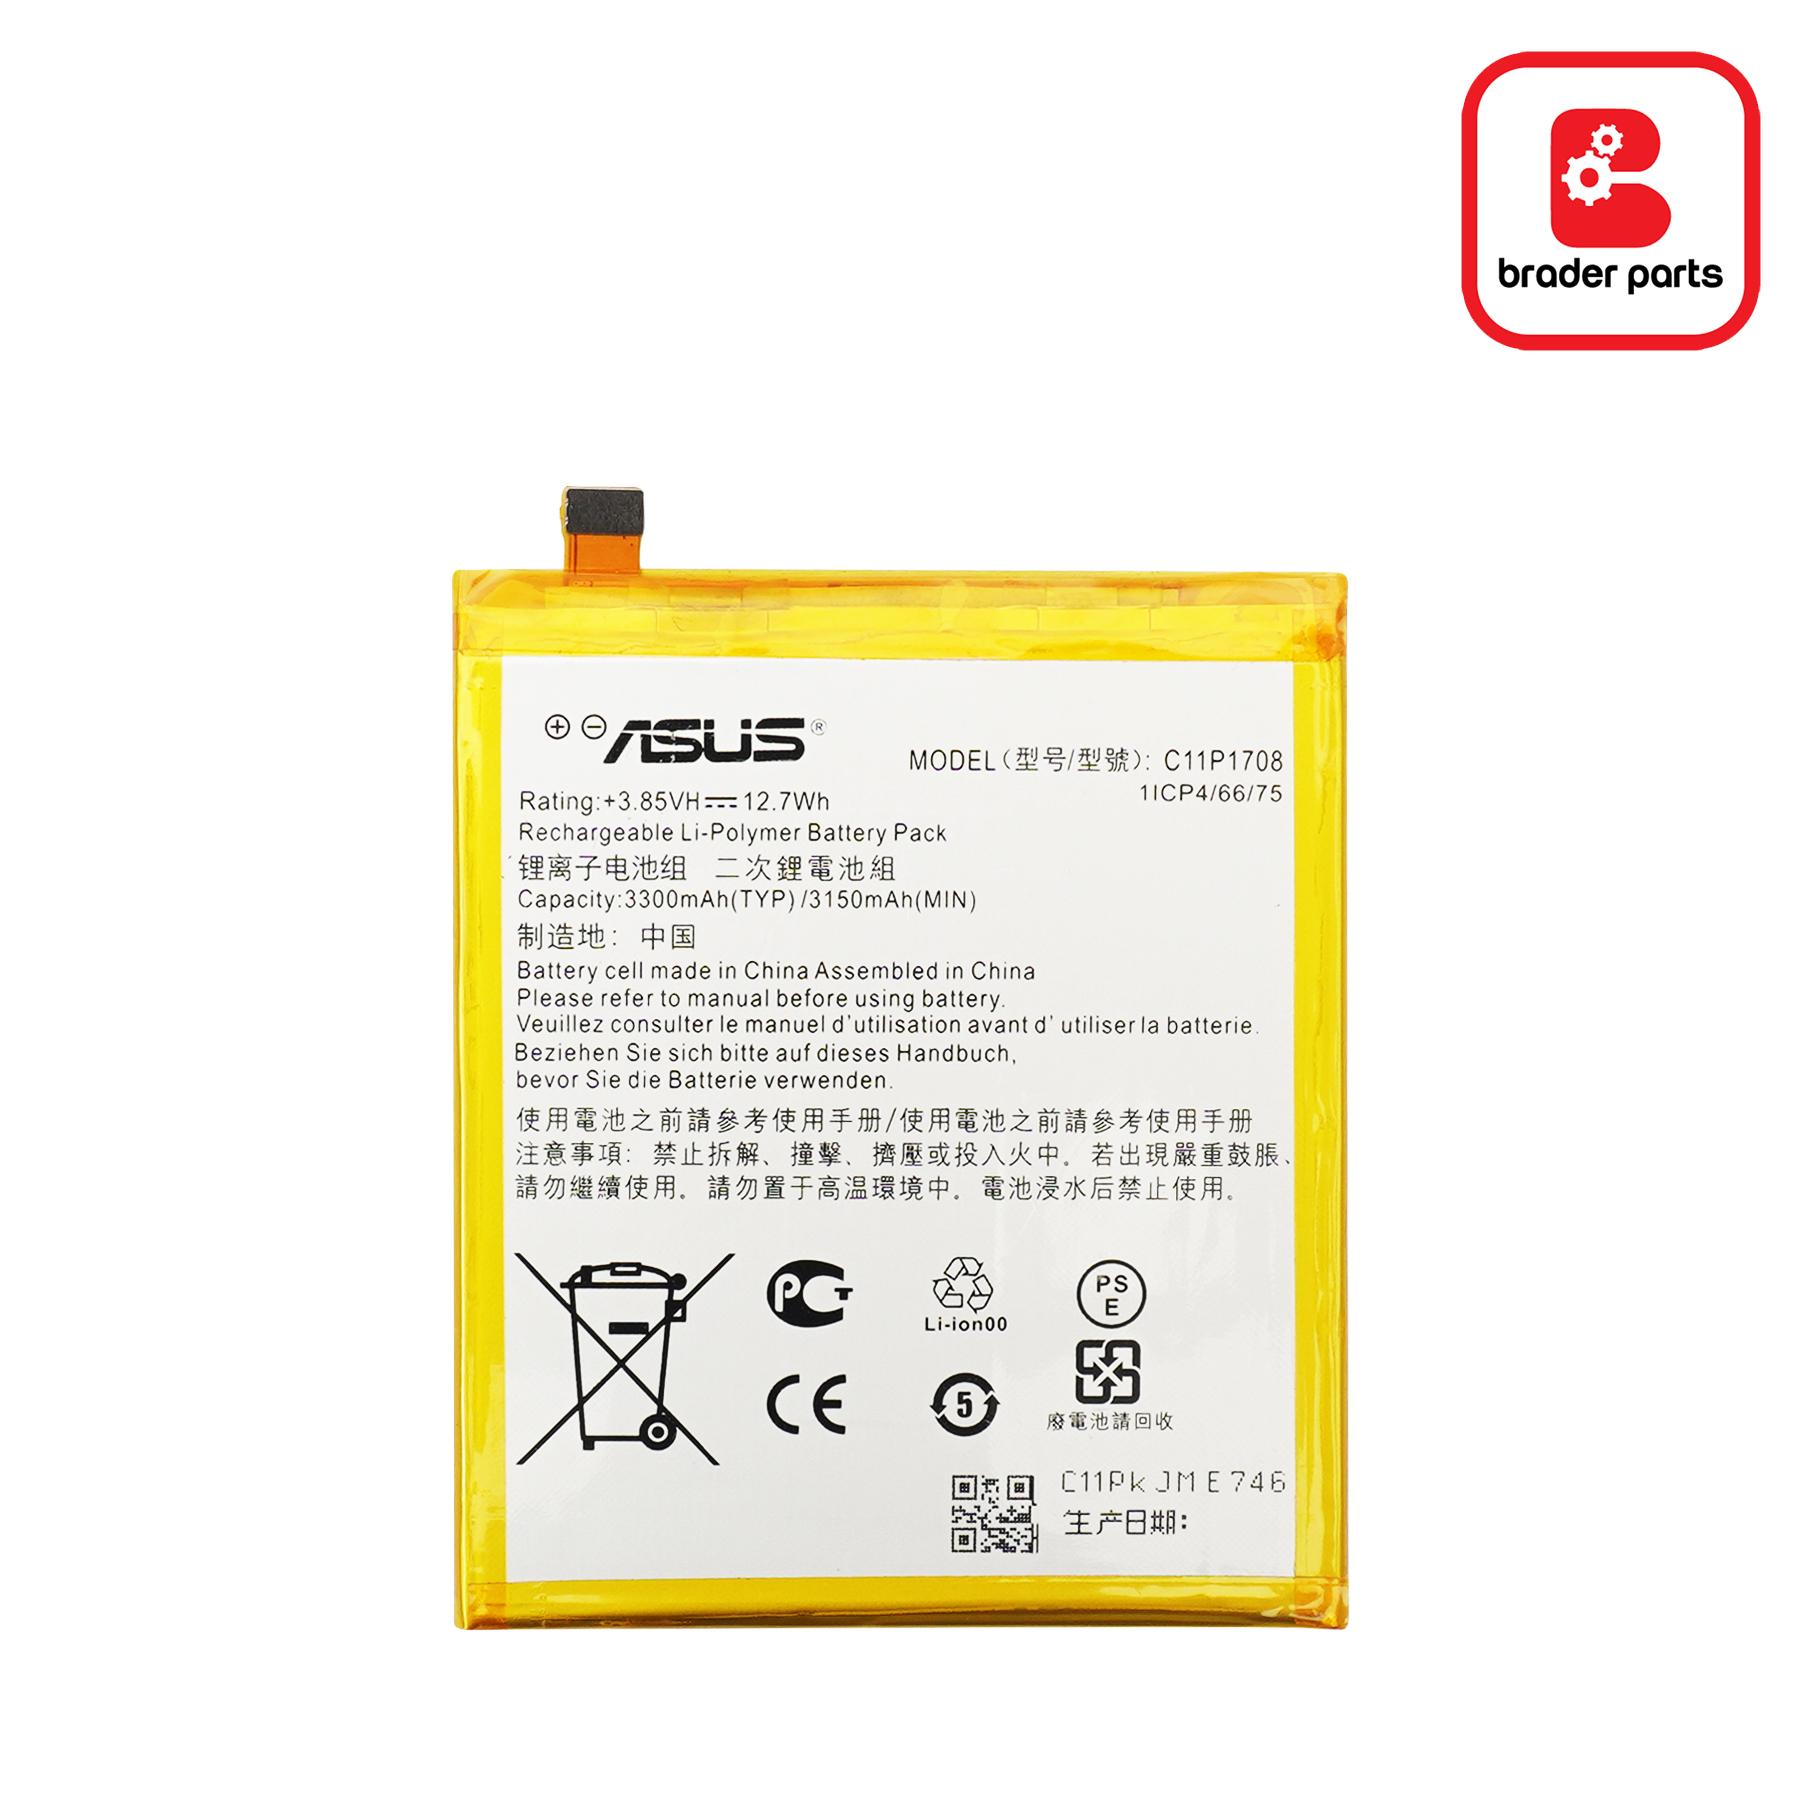 Baterai Asus Zenfone 5 2018 ZE620KL C11P1708